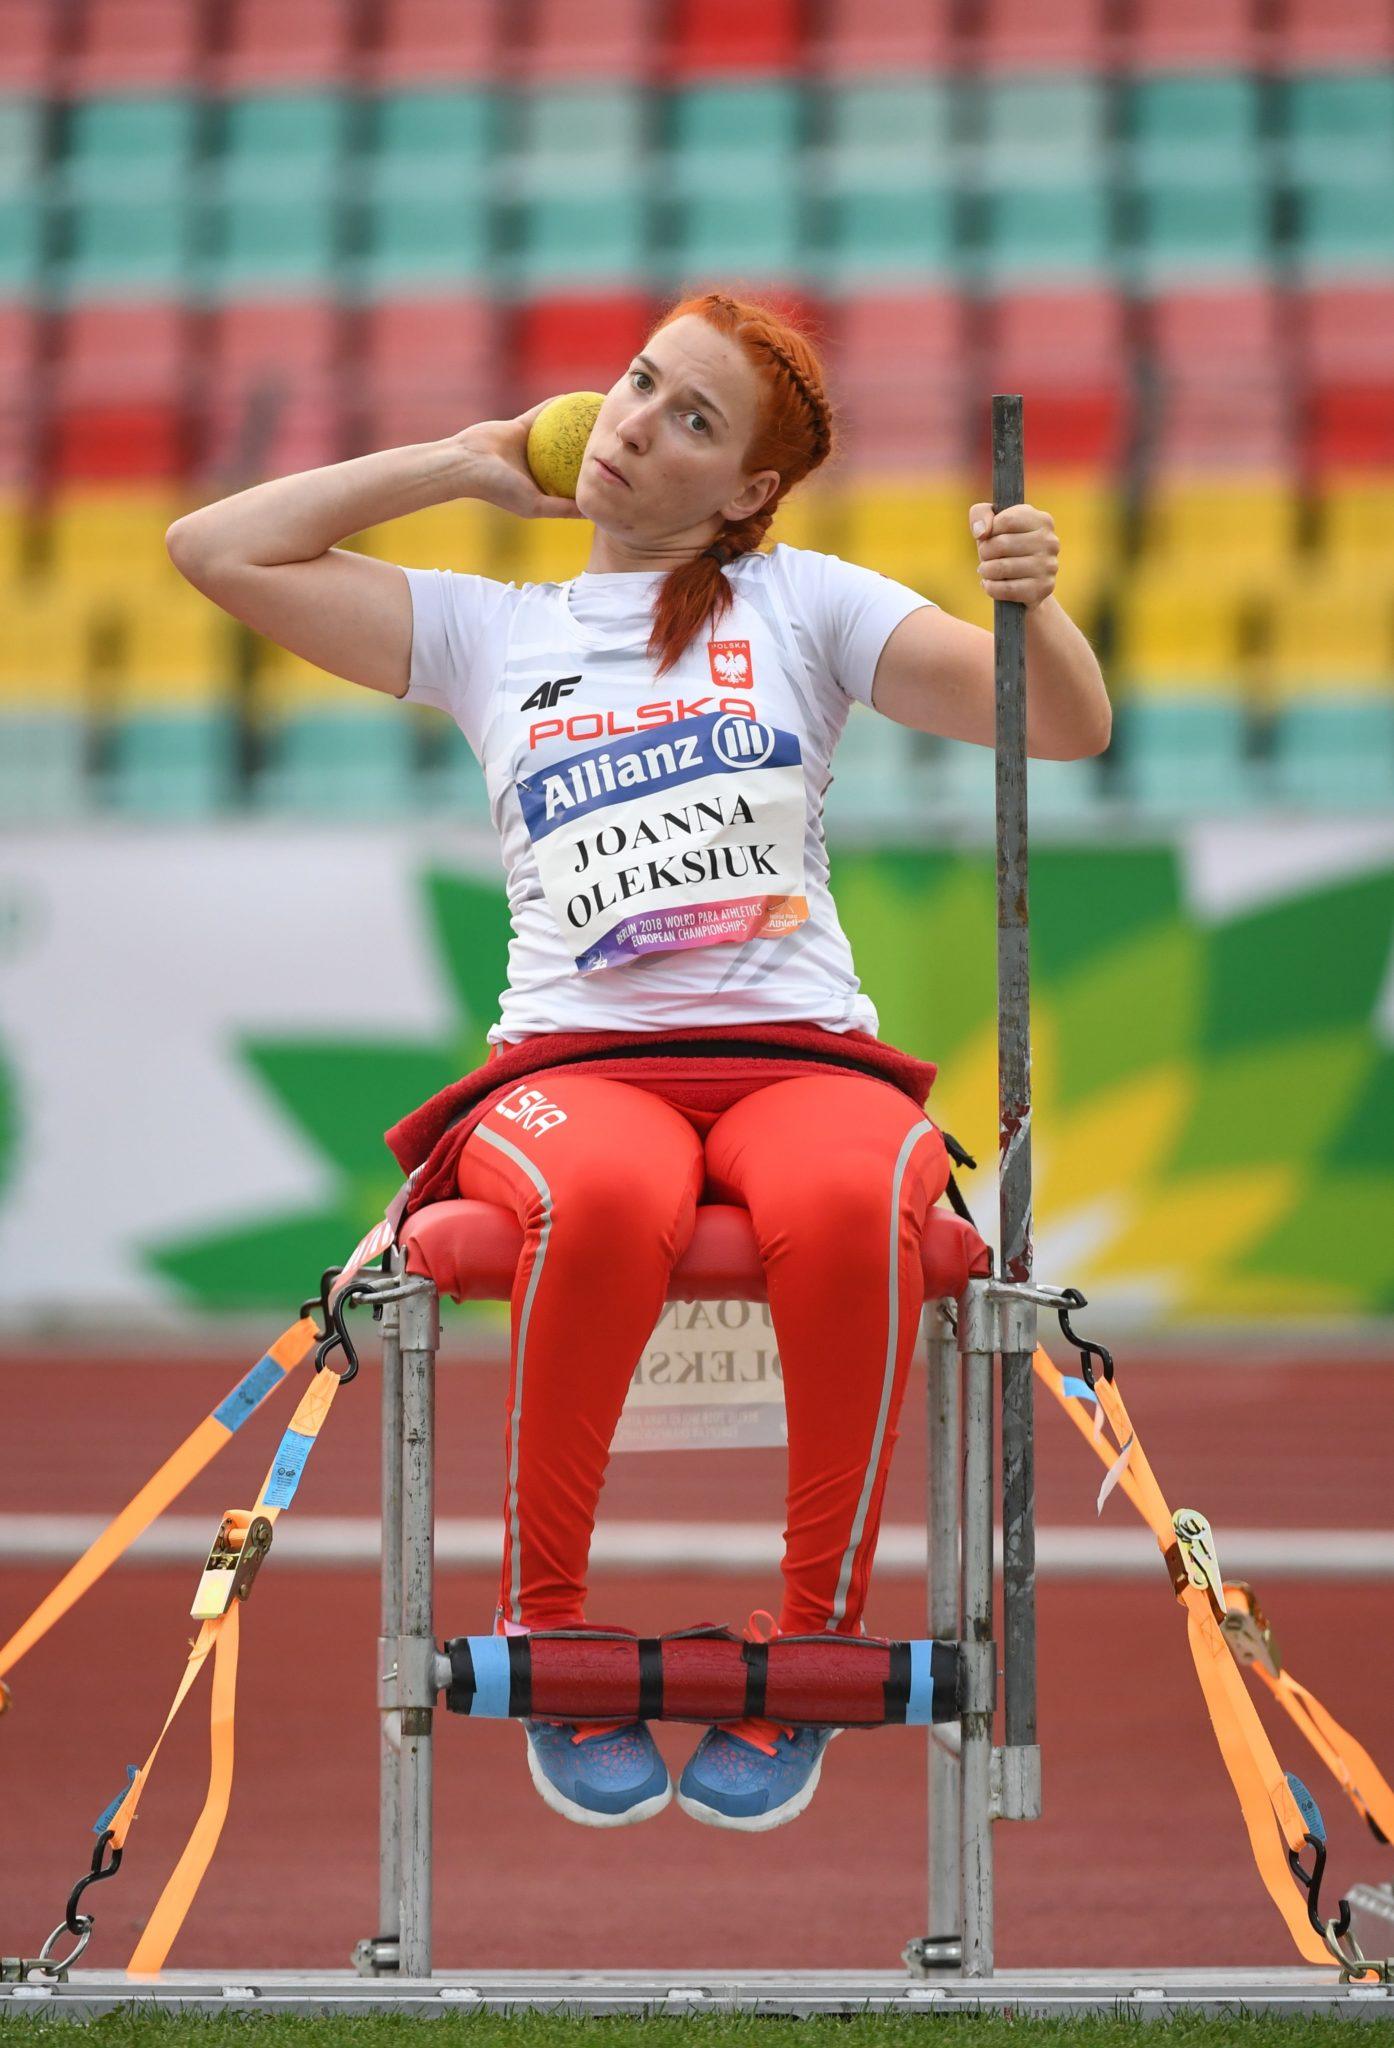 Joanna Oleksiuk w finale konkursu pchnięcia kulą